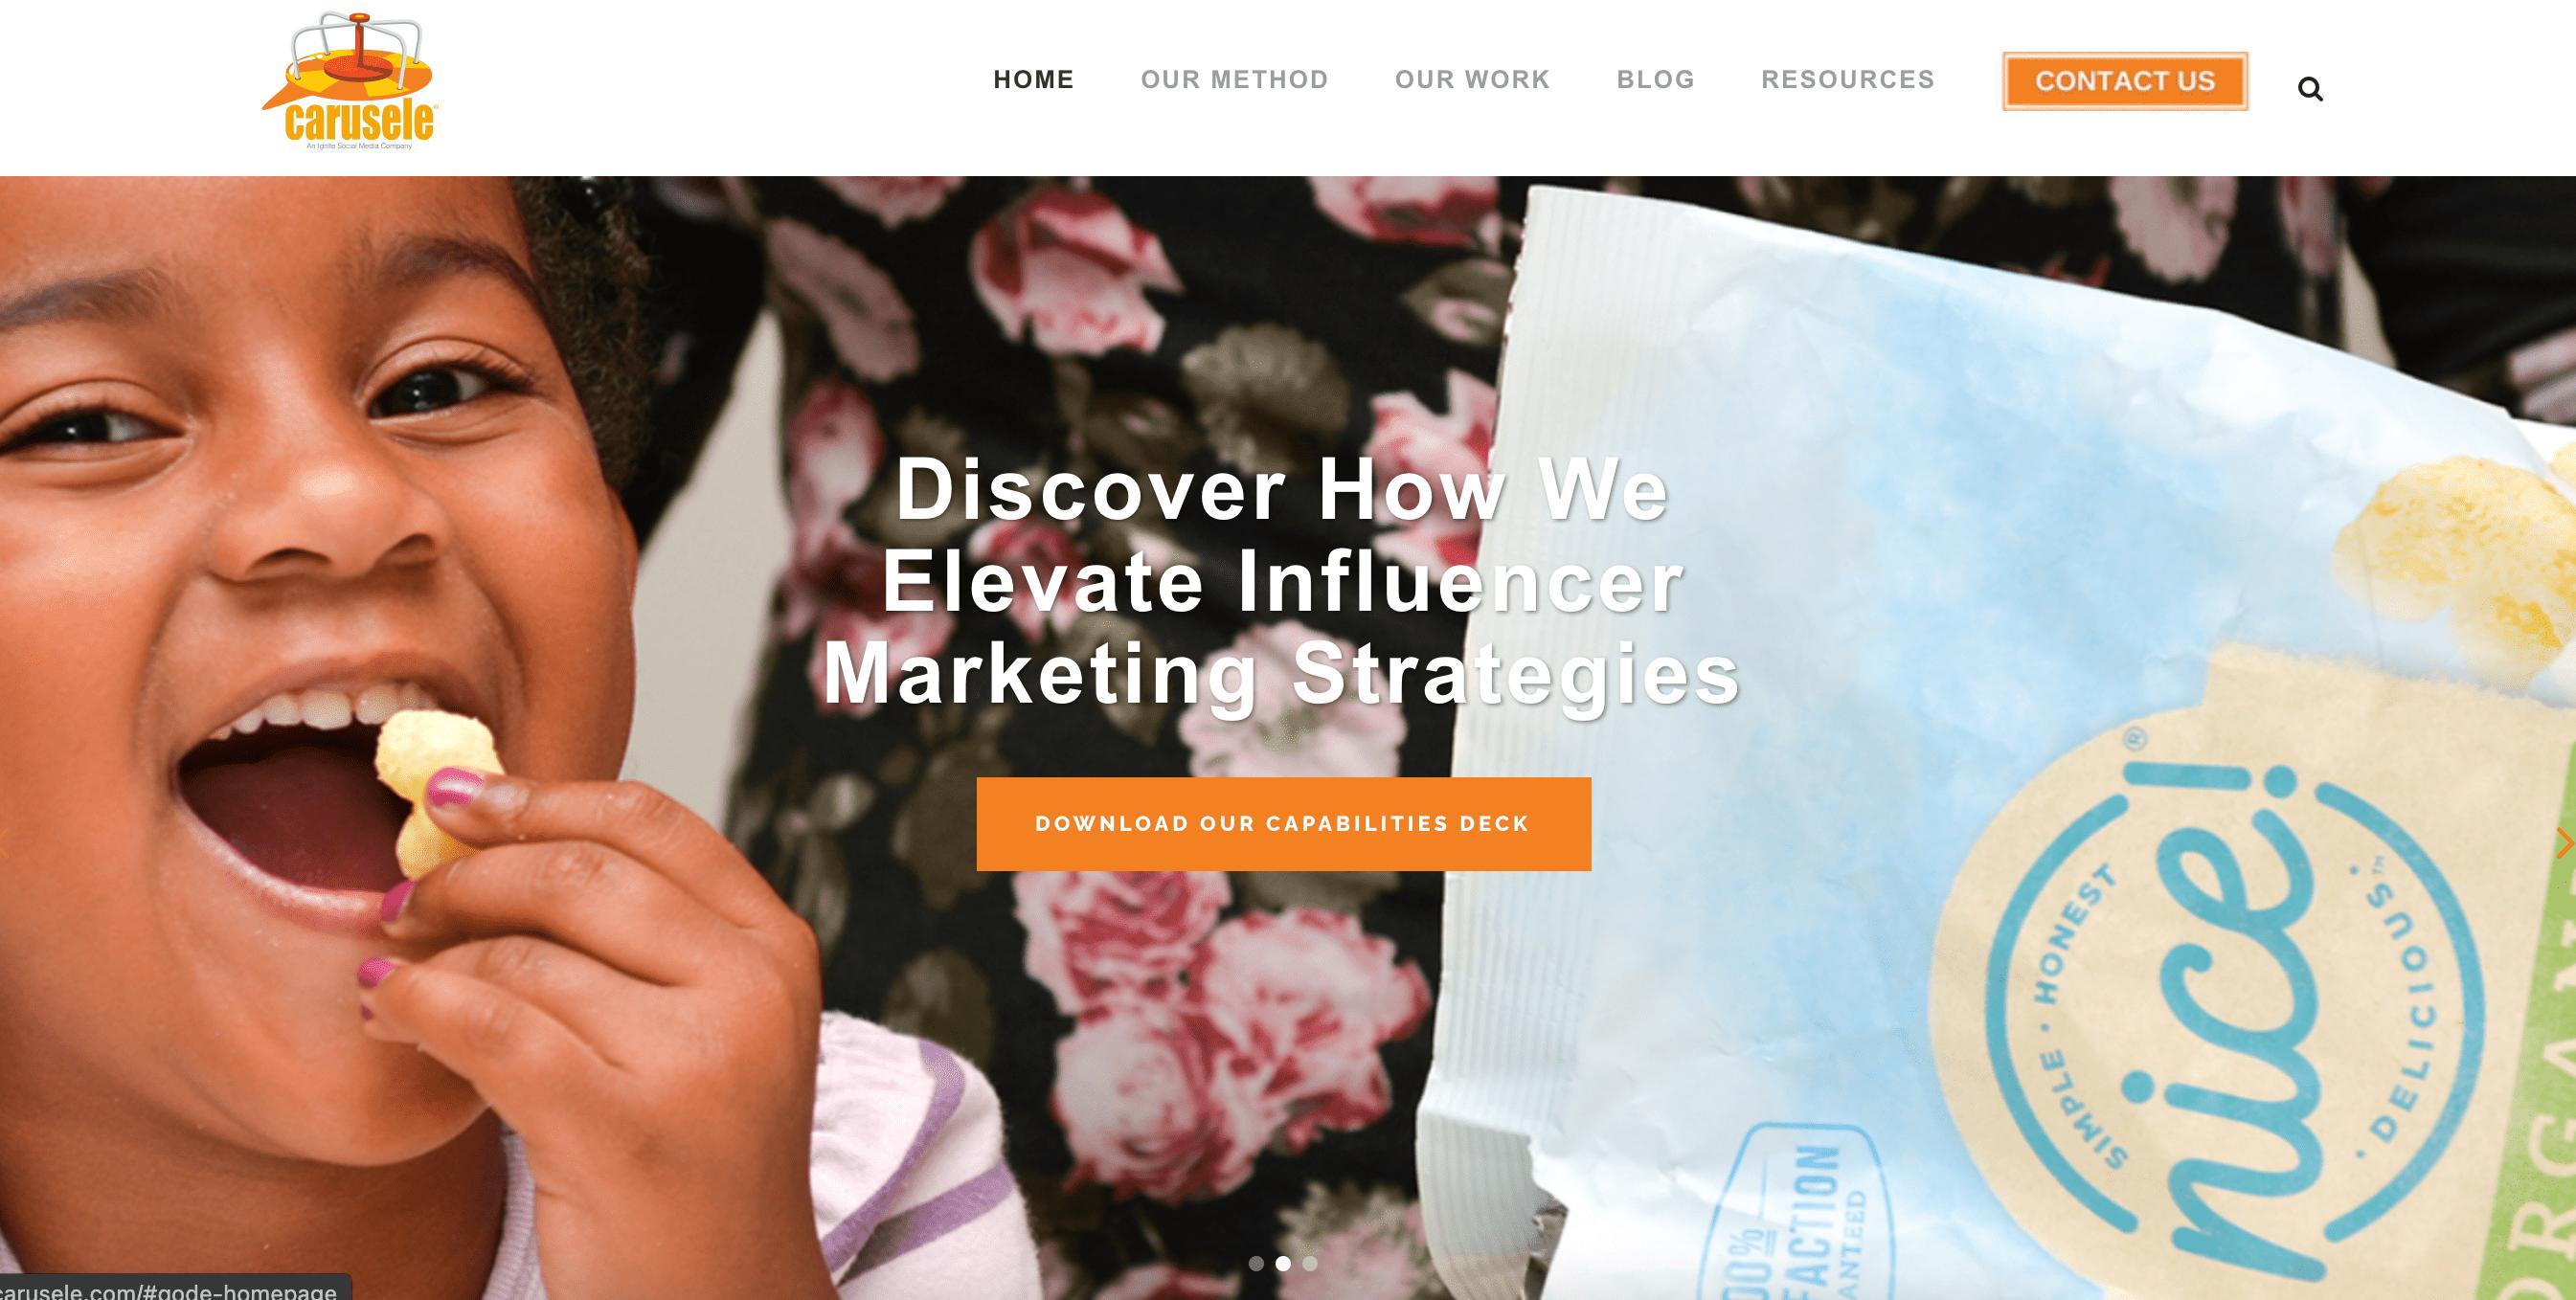 Carusele-influencer-marketing-company